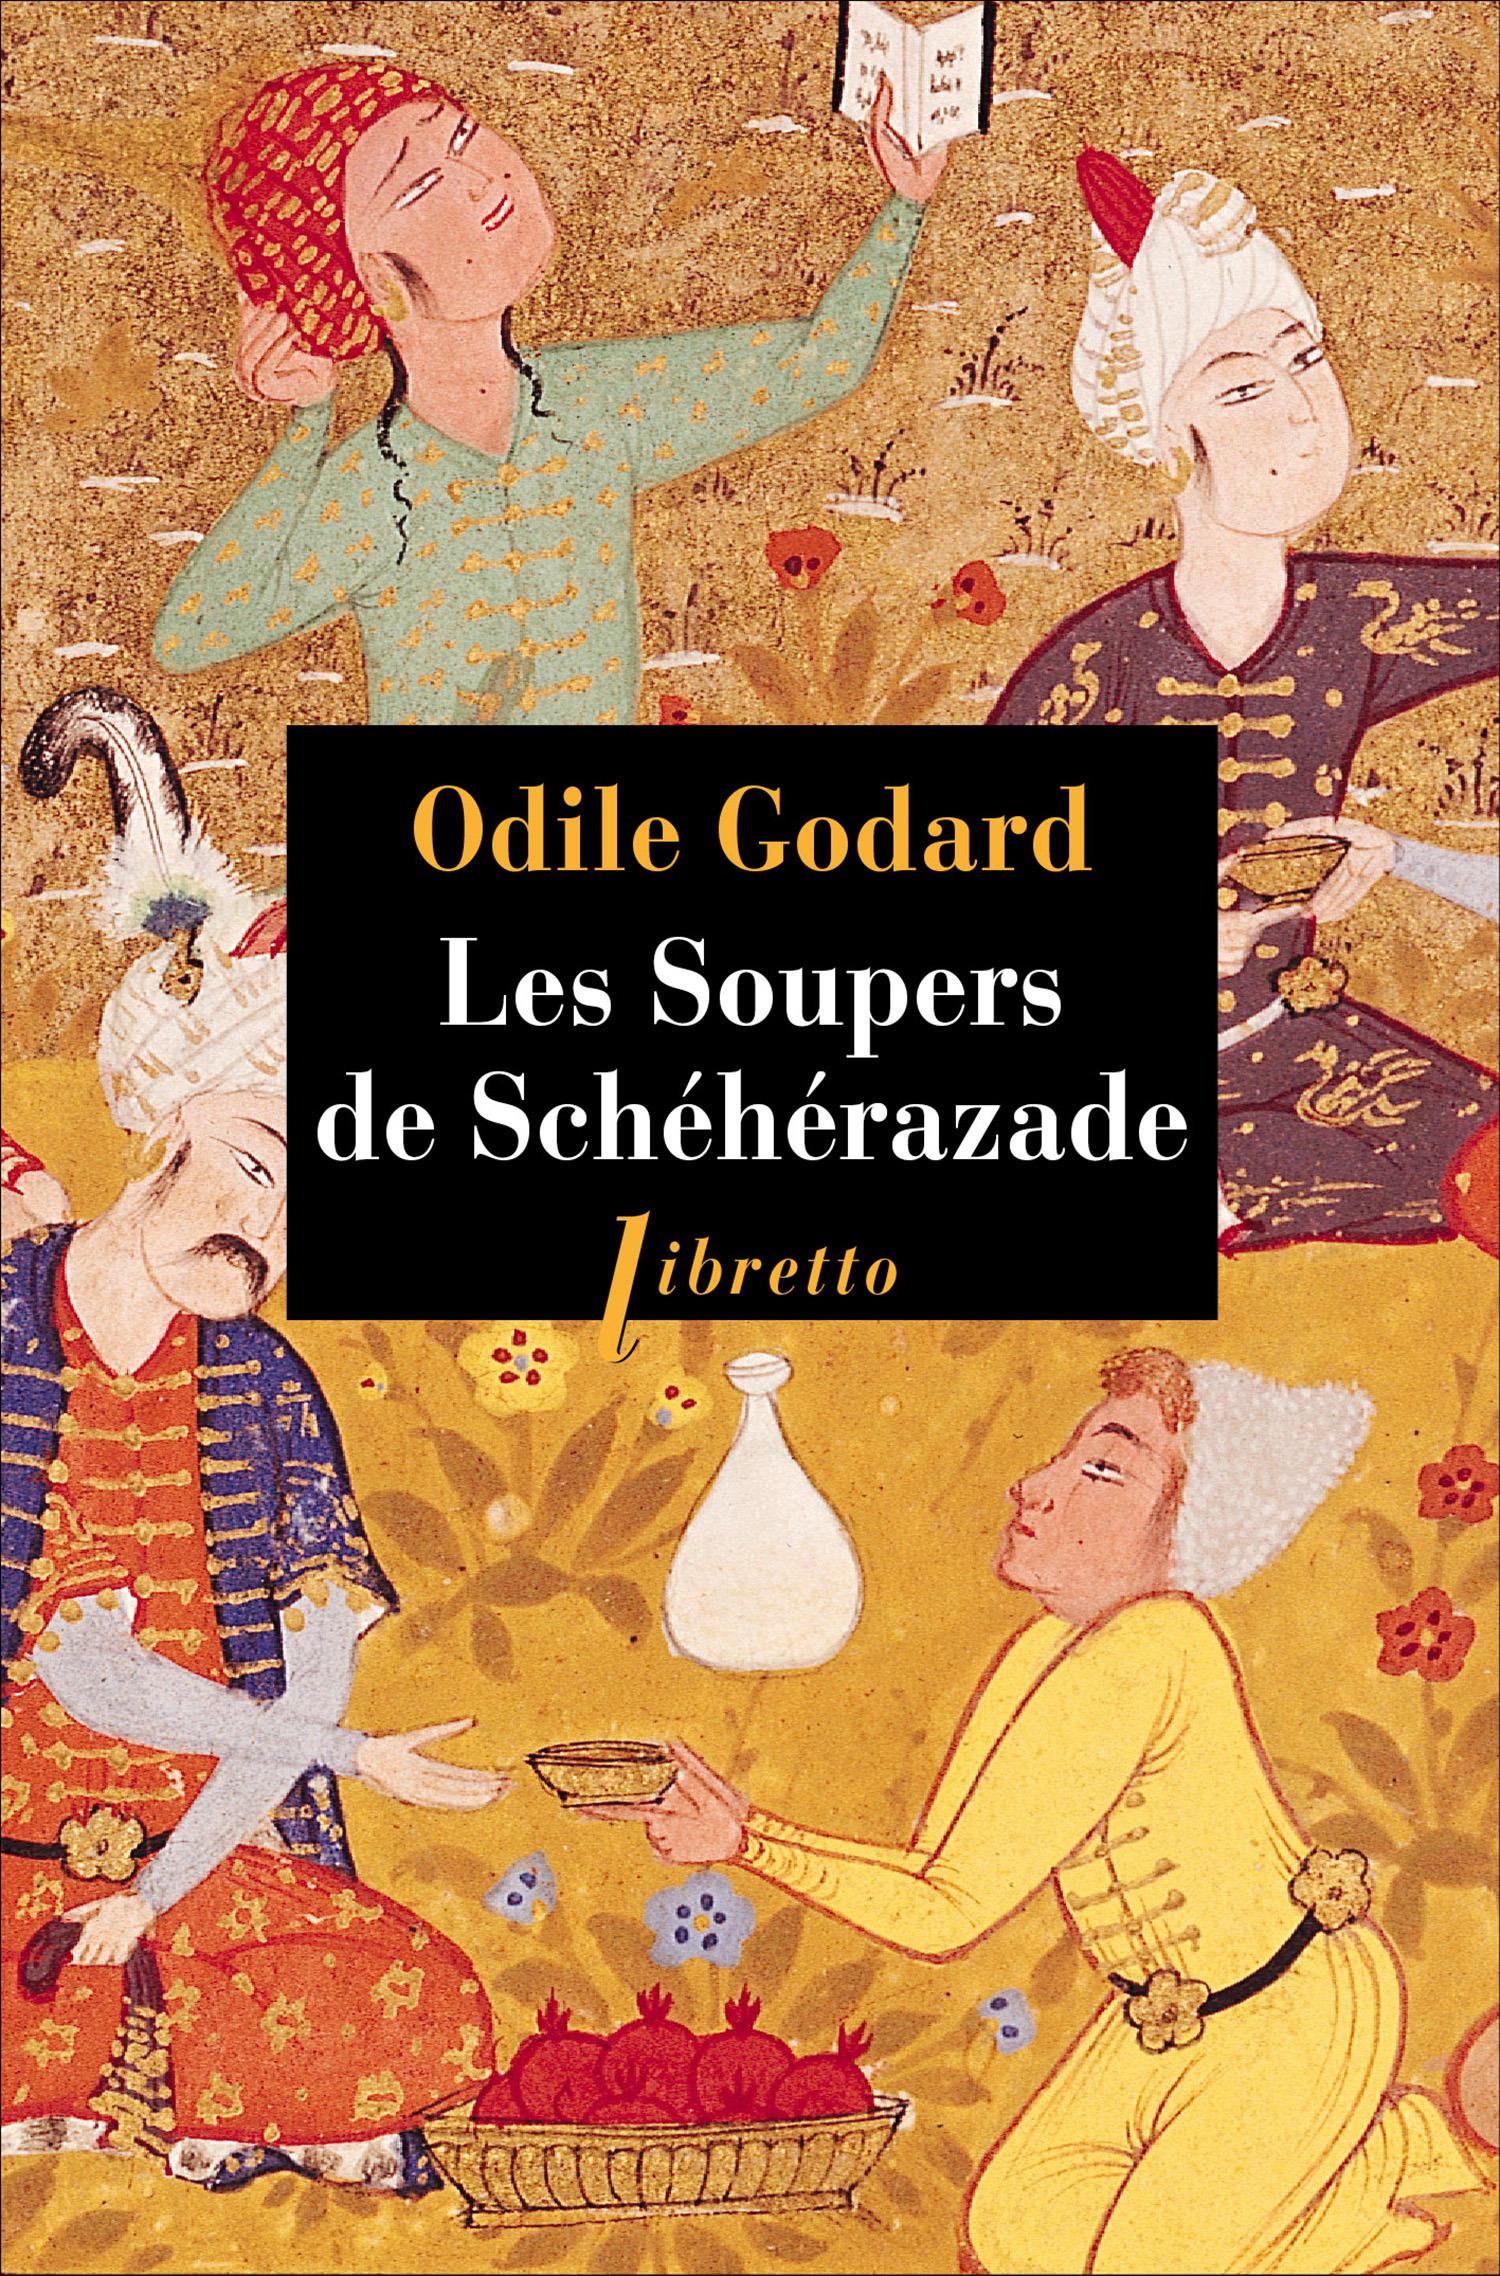 Odile Godard Les soupers de Schéhérazade